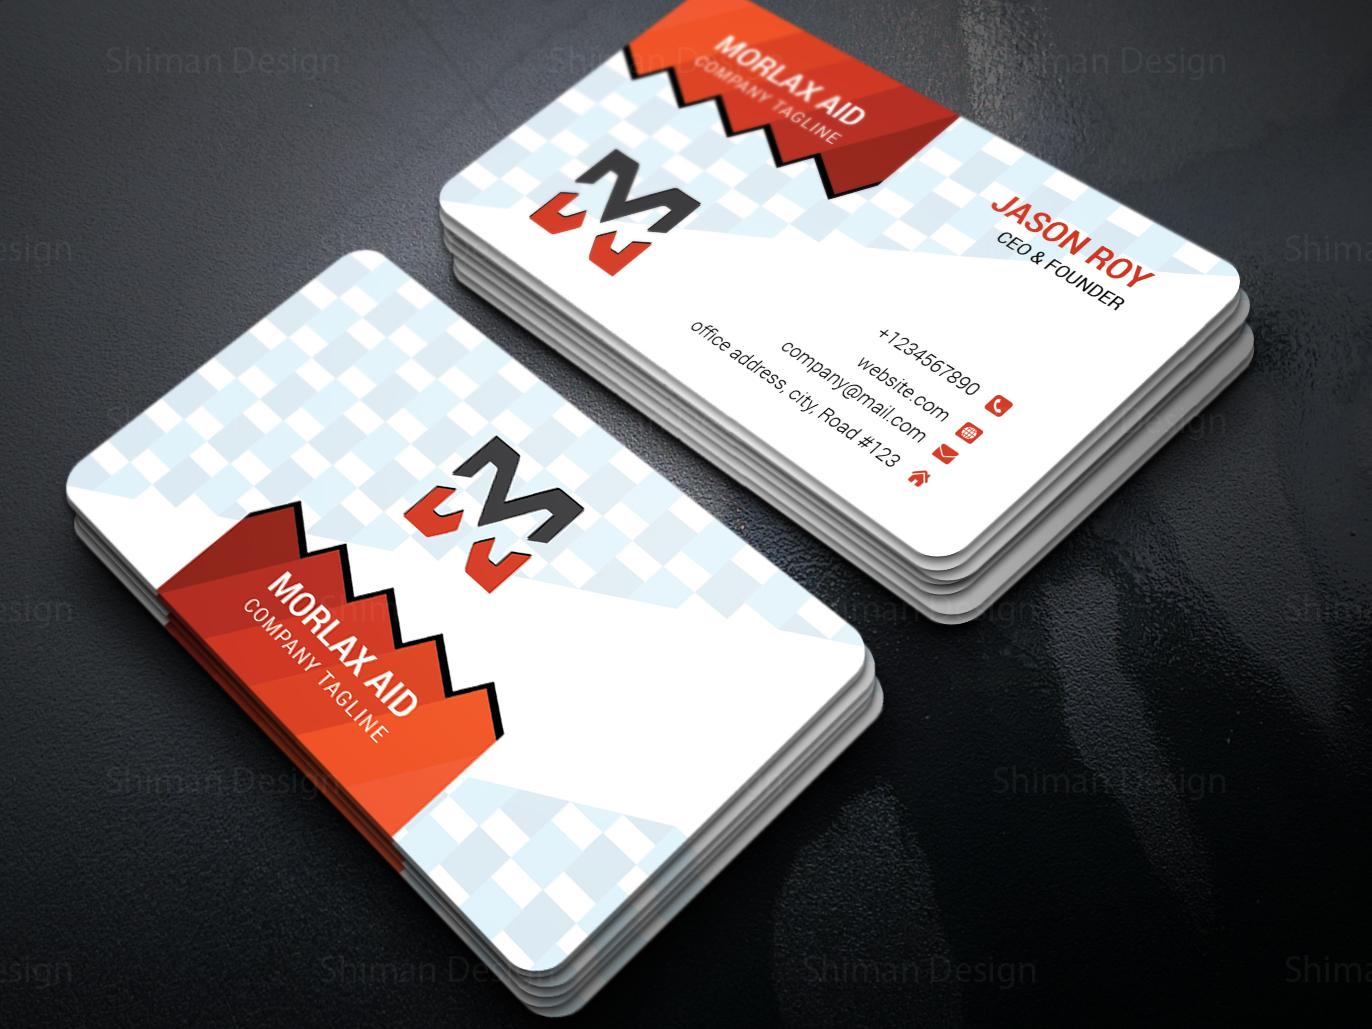 Business Card id card creative business card unique business card 300dpi print ready business card template business card mockup business card design business card illustration photoshop illustrator design business identity branding